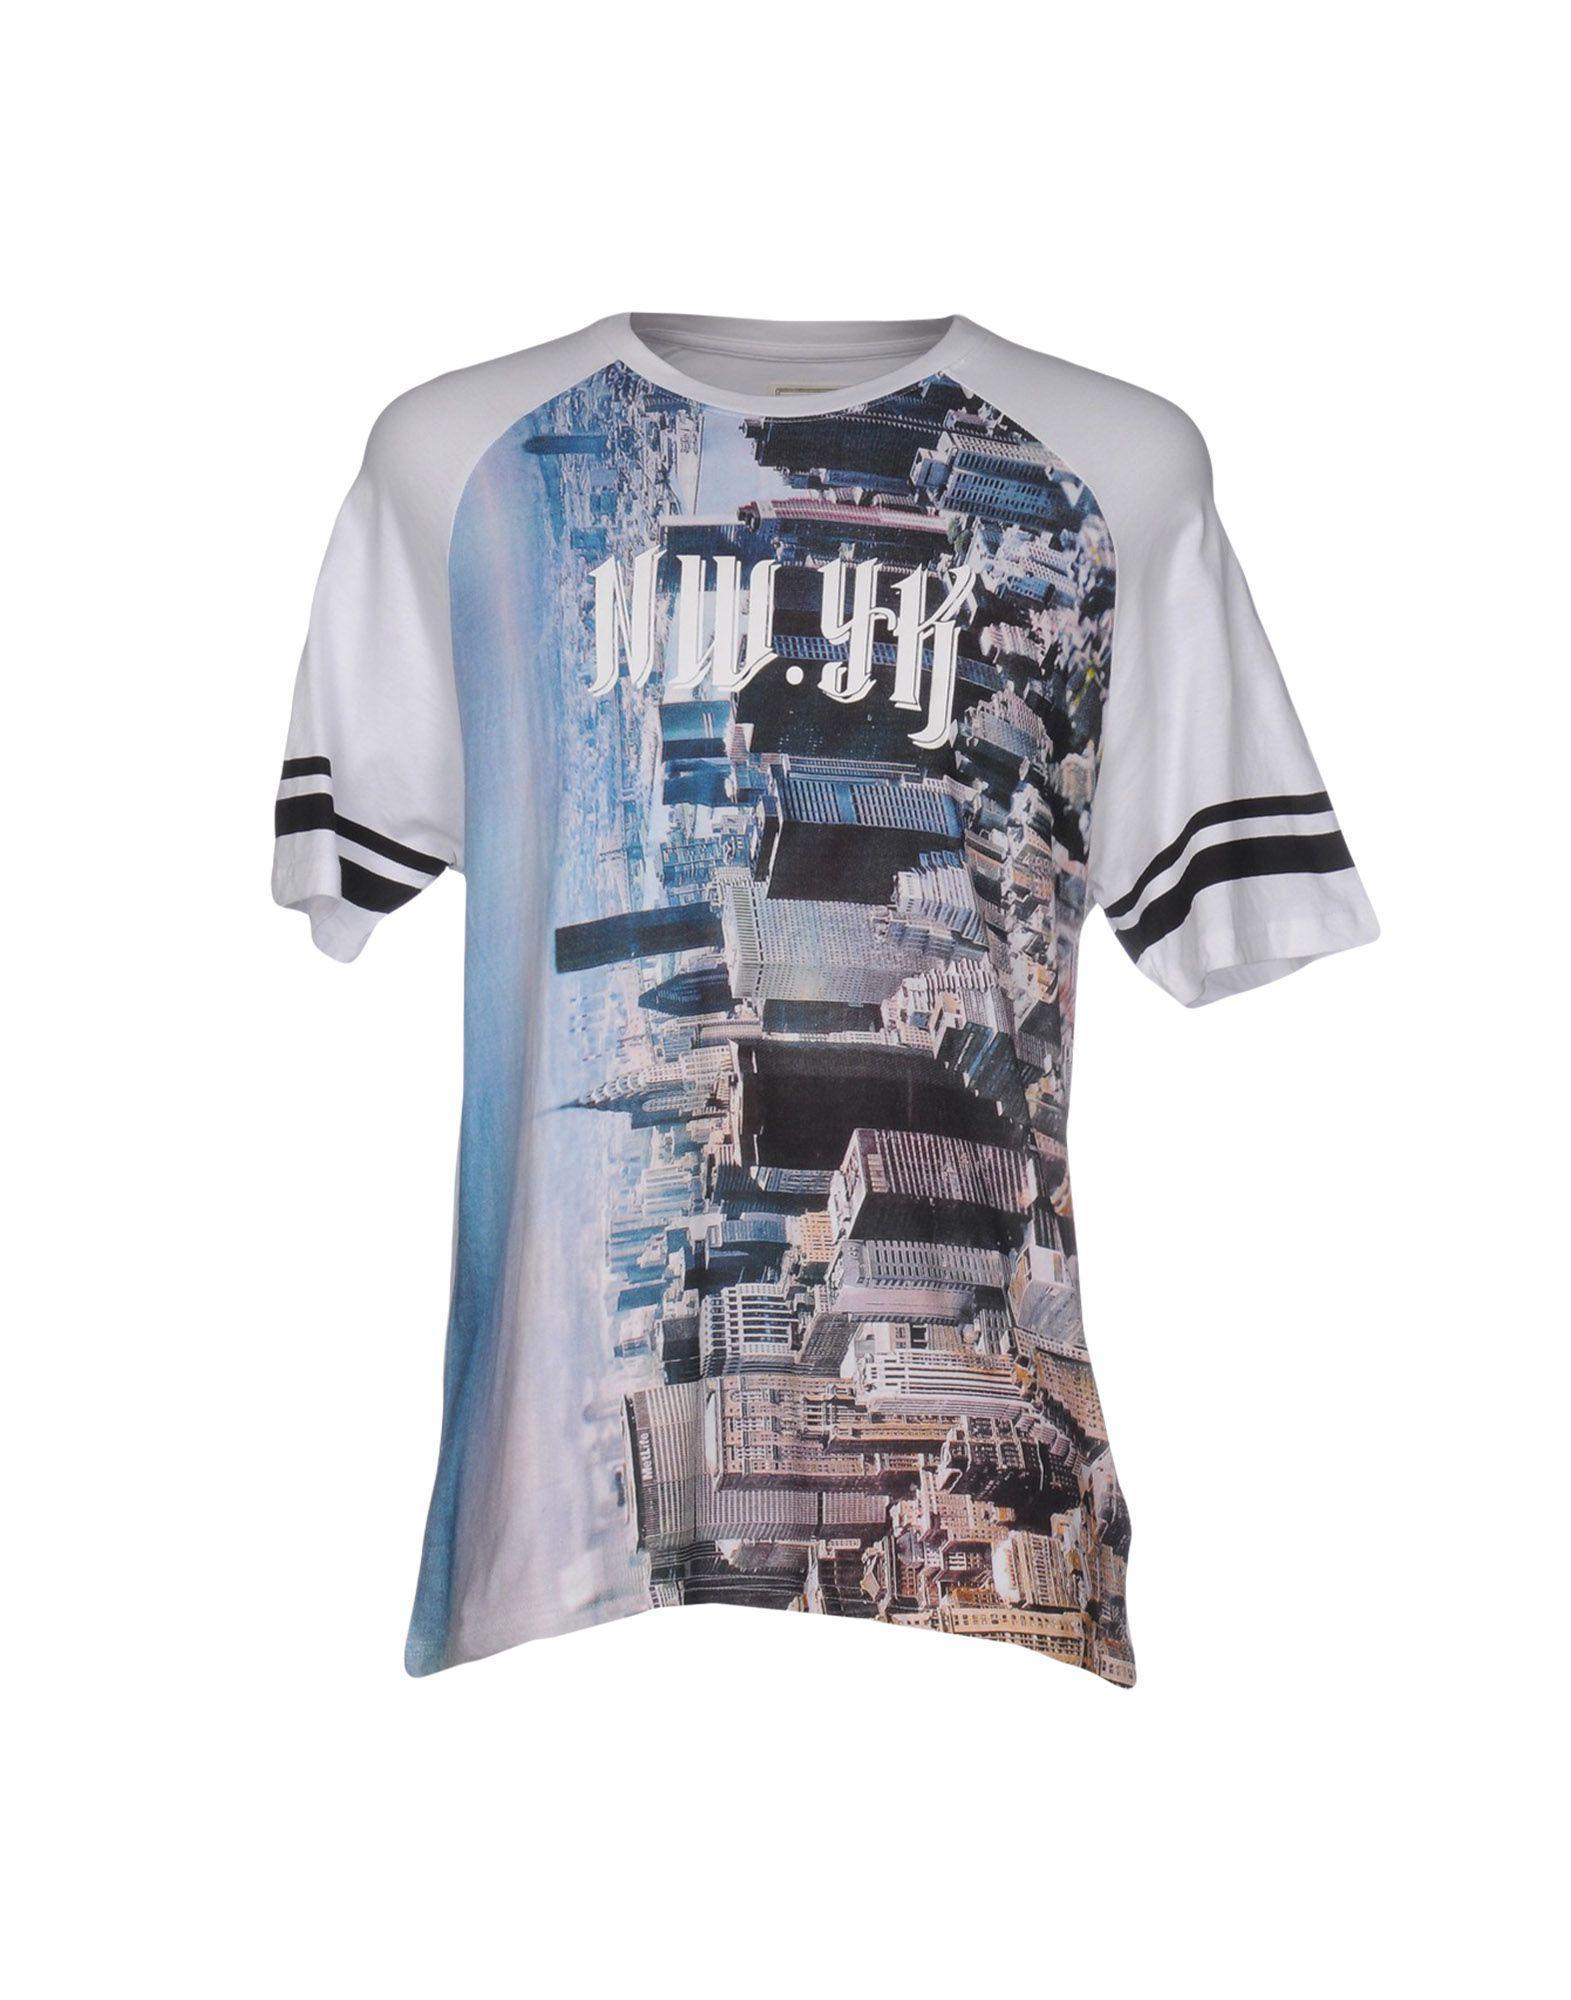 lyst eleven paris t shirt in white for men. Black Bedroom Furniture Sets. Home Design Ideas